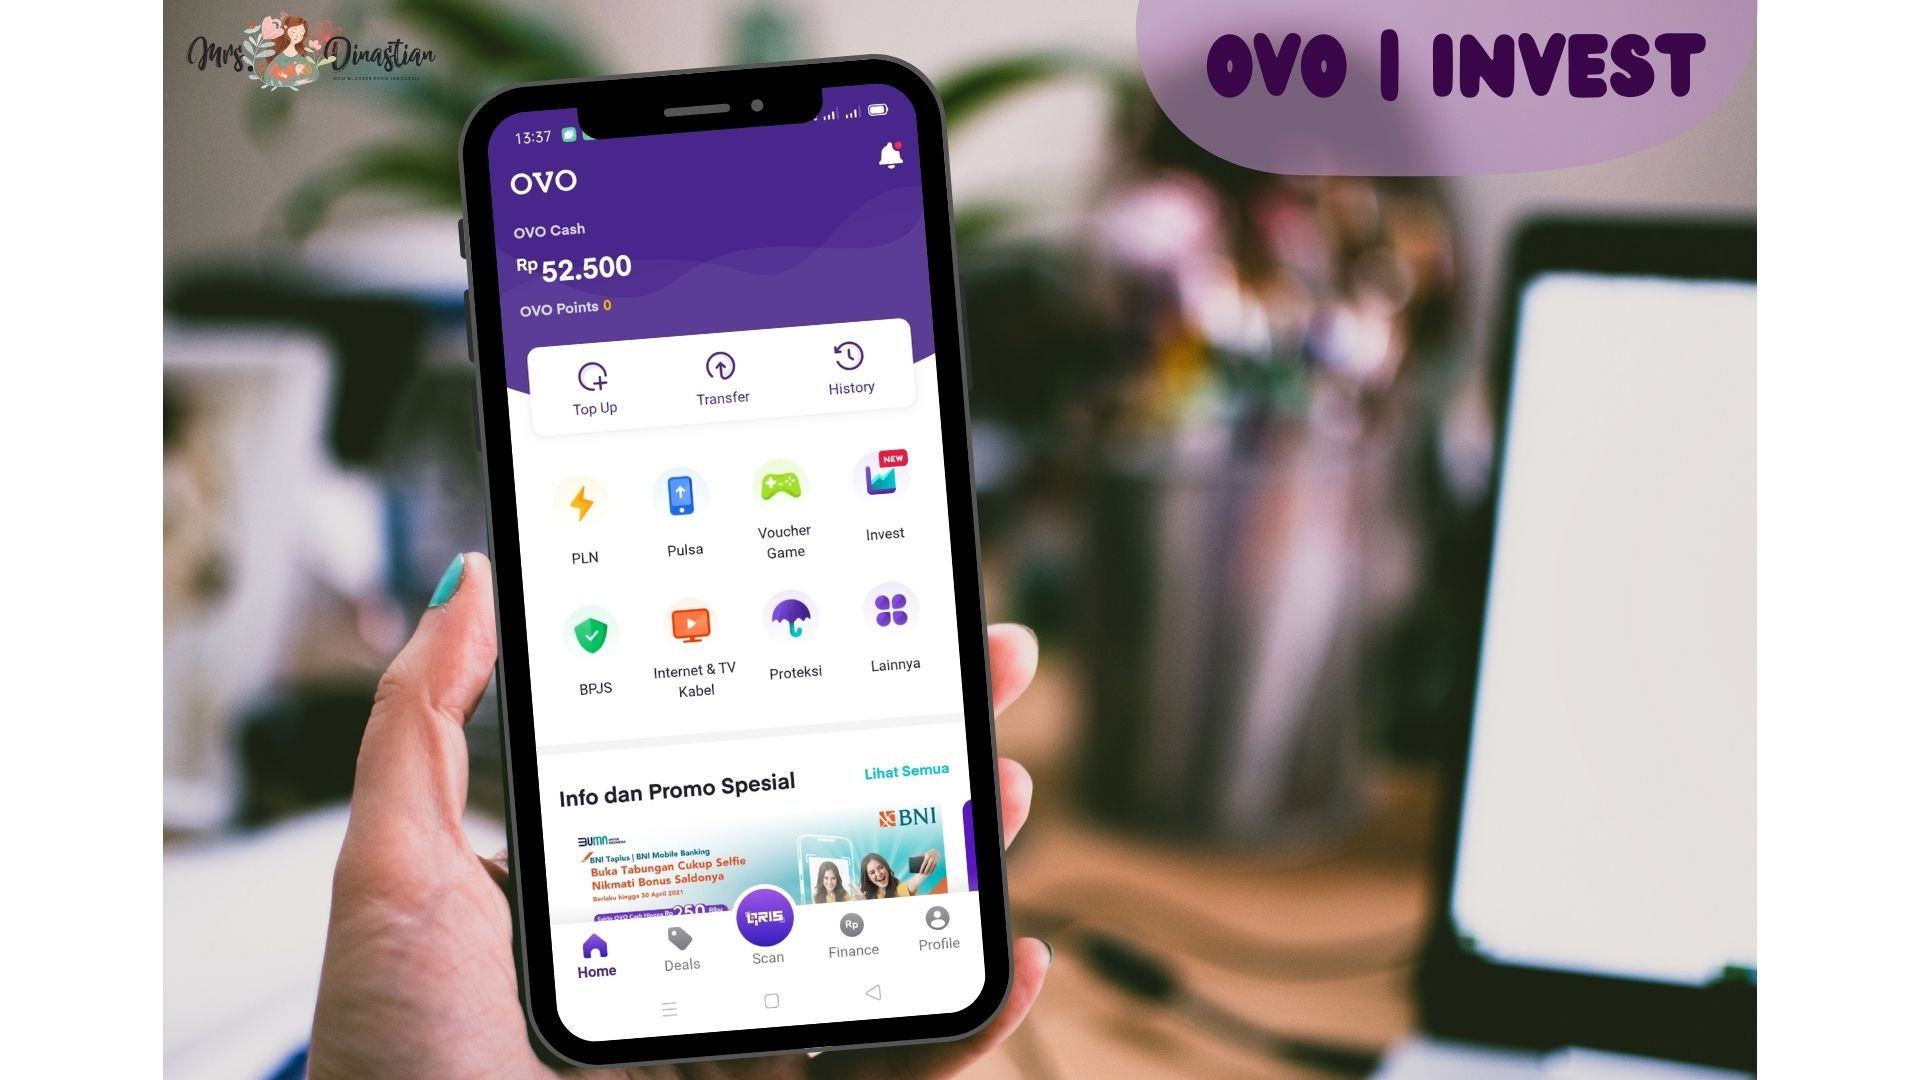 OVO | Invest